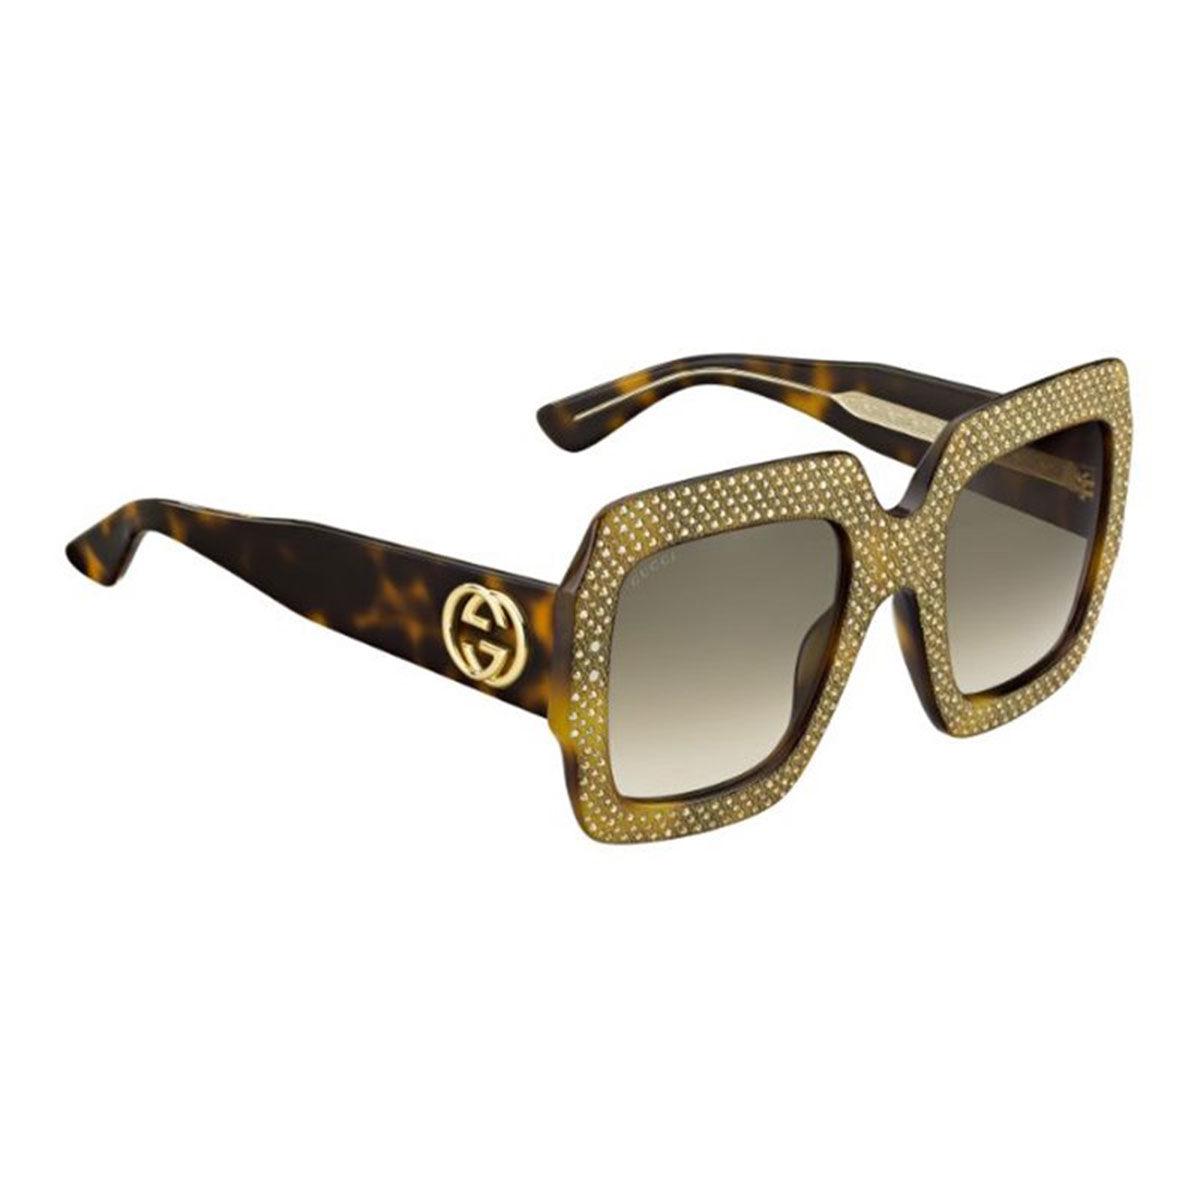 38e1a04aa3a1c2 Okulary GUCCI – Kup Teraz! Najlepsze ceny i opinie! Sklep Moliera2.com